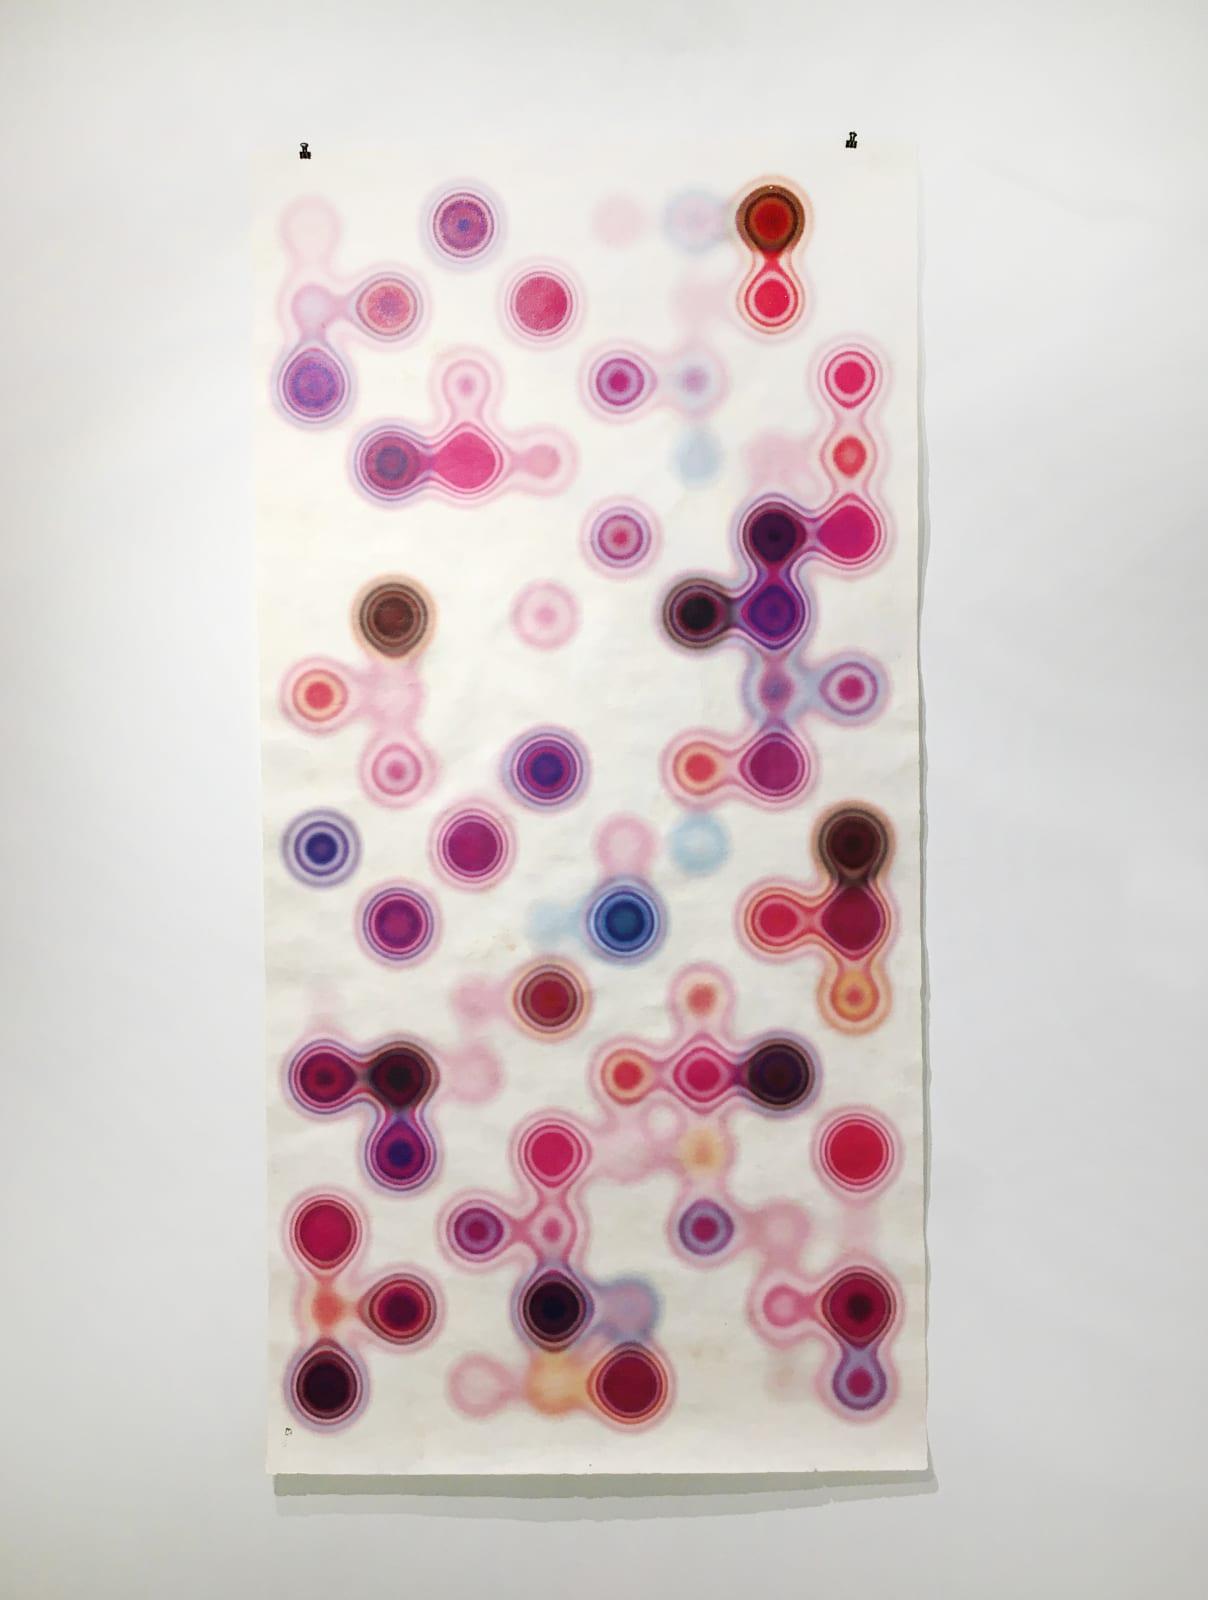 Andrés Ferrandis Amate II, 2020 Archival print 1/1 on handmade amate paper 94 x 45.5